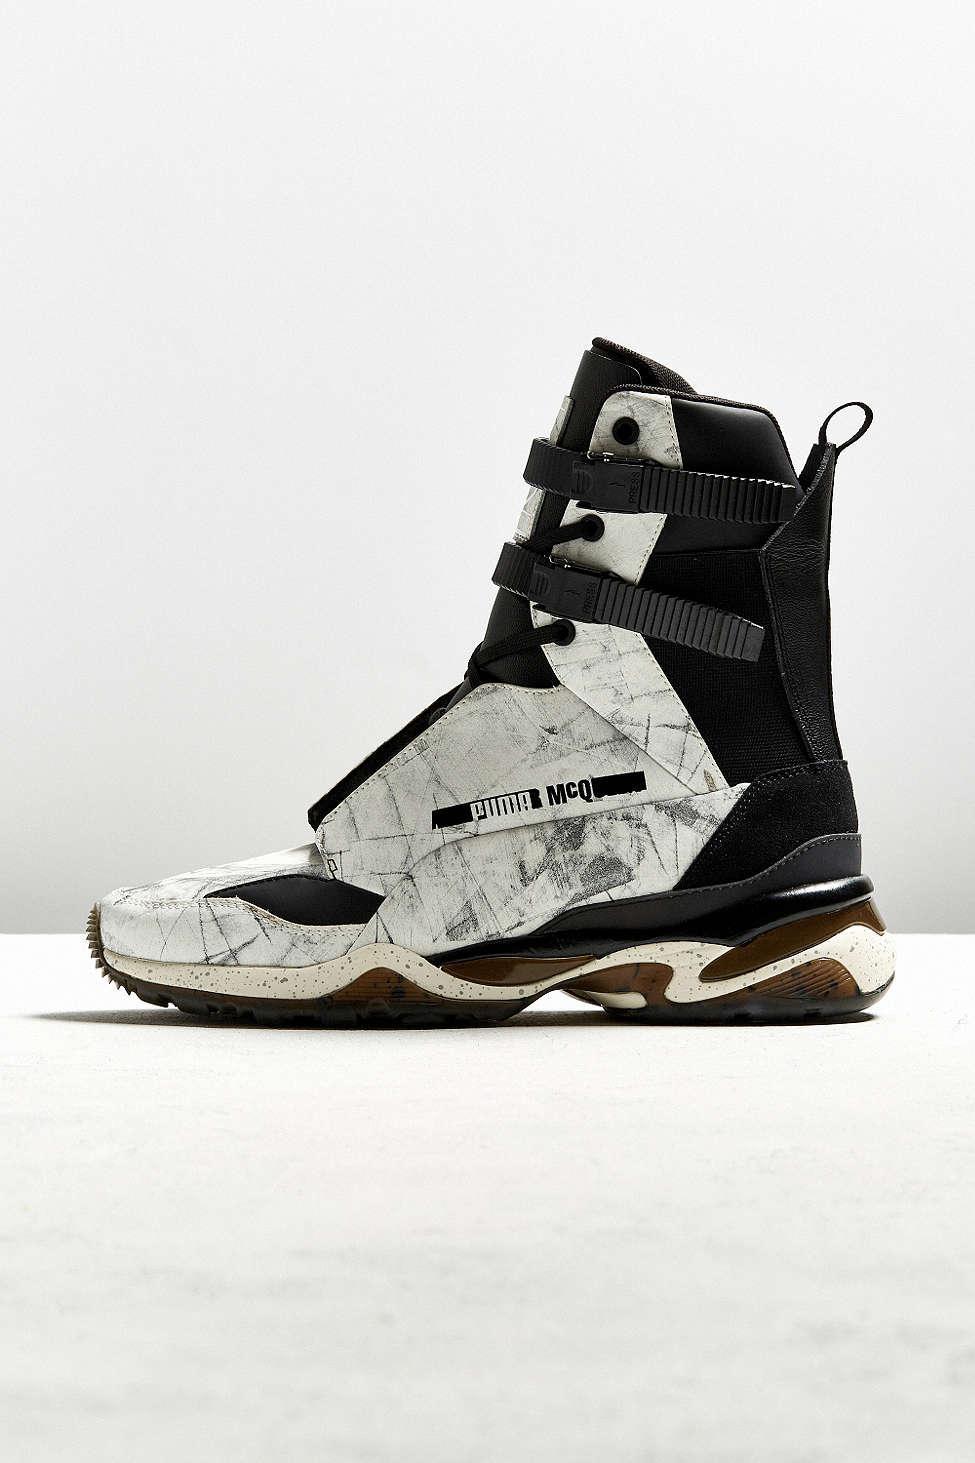 Lyst - PUMA X Mcq By Alexander Mcqueen Tech Runner Mid Sneaker in ... 6eaa7ab5f